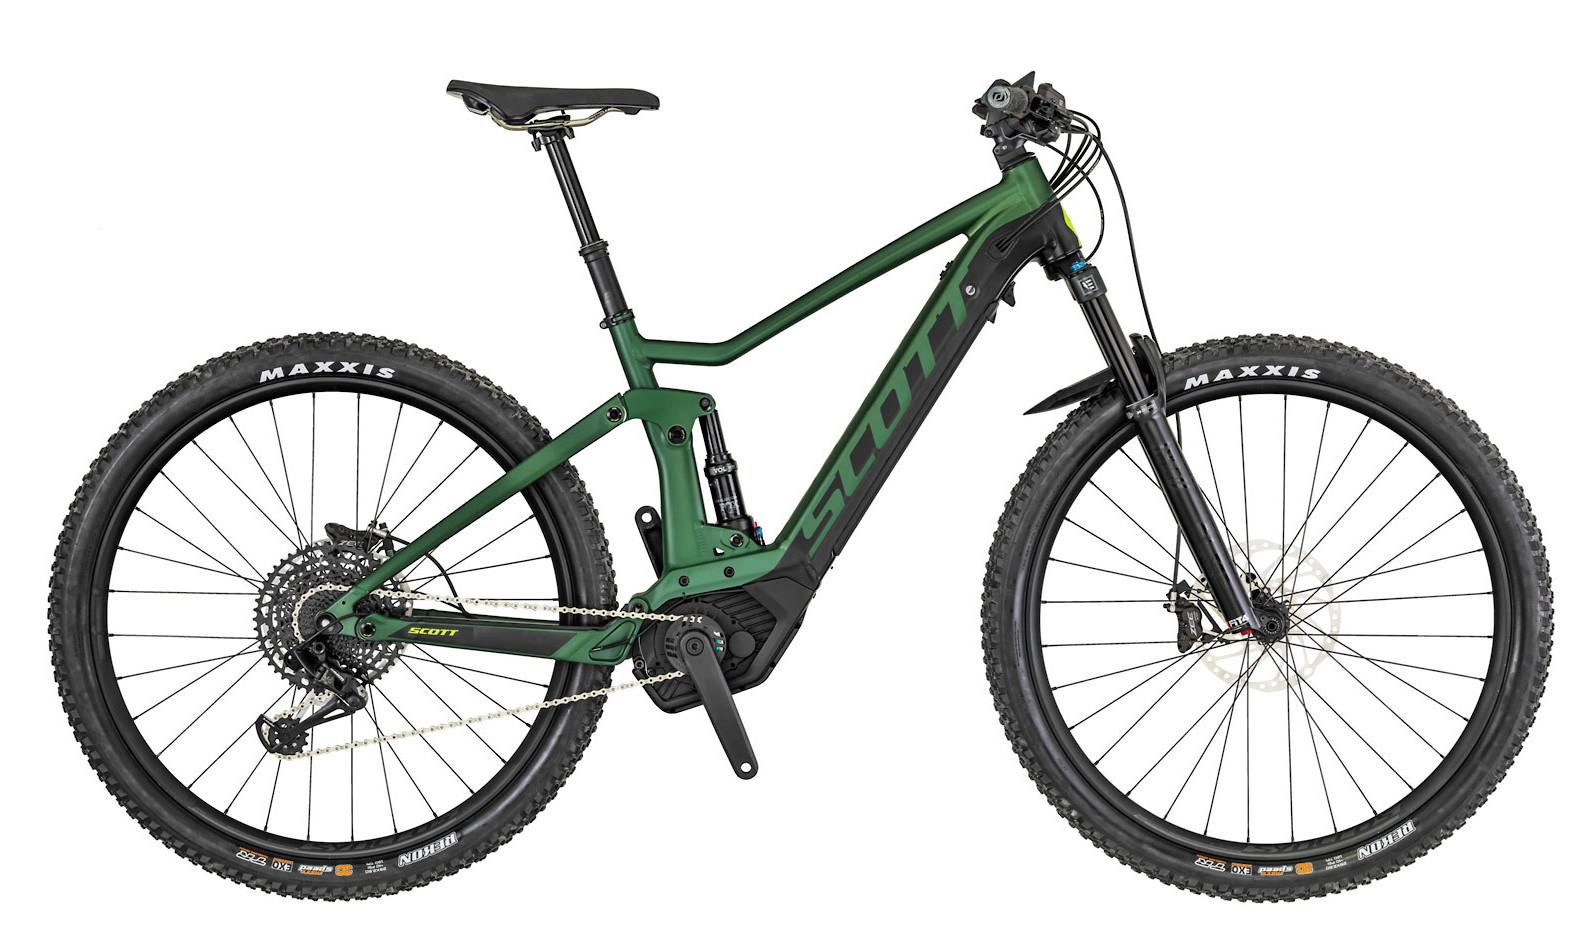 2019 Scott Strike eRide 910 E-Bike